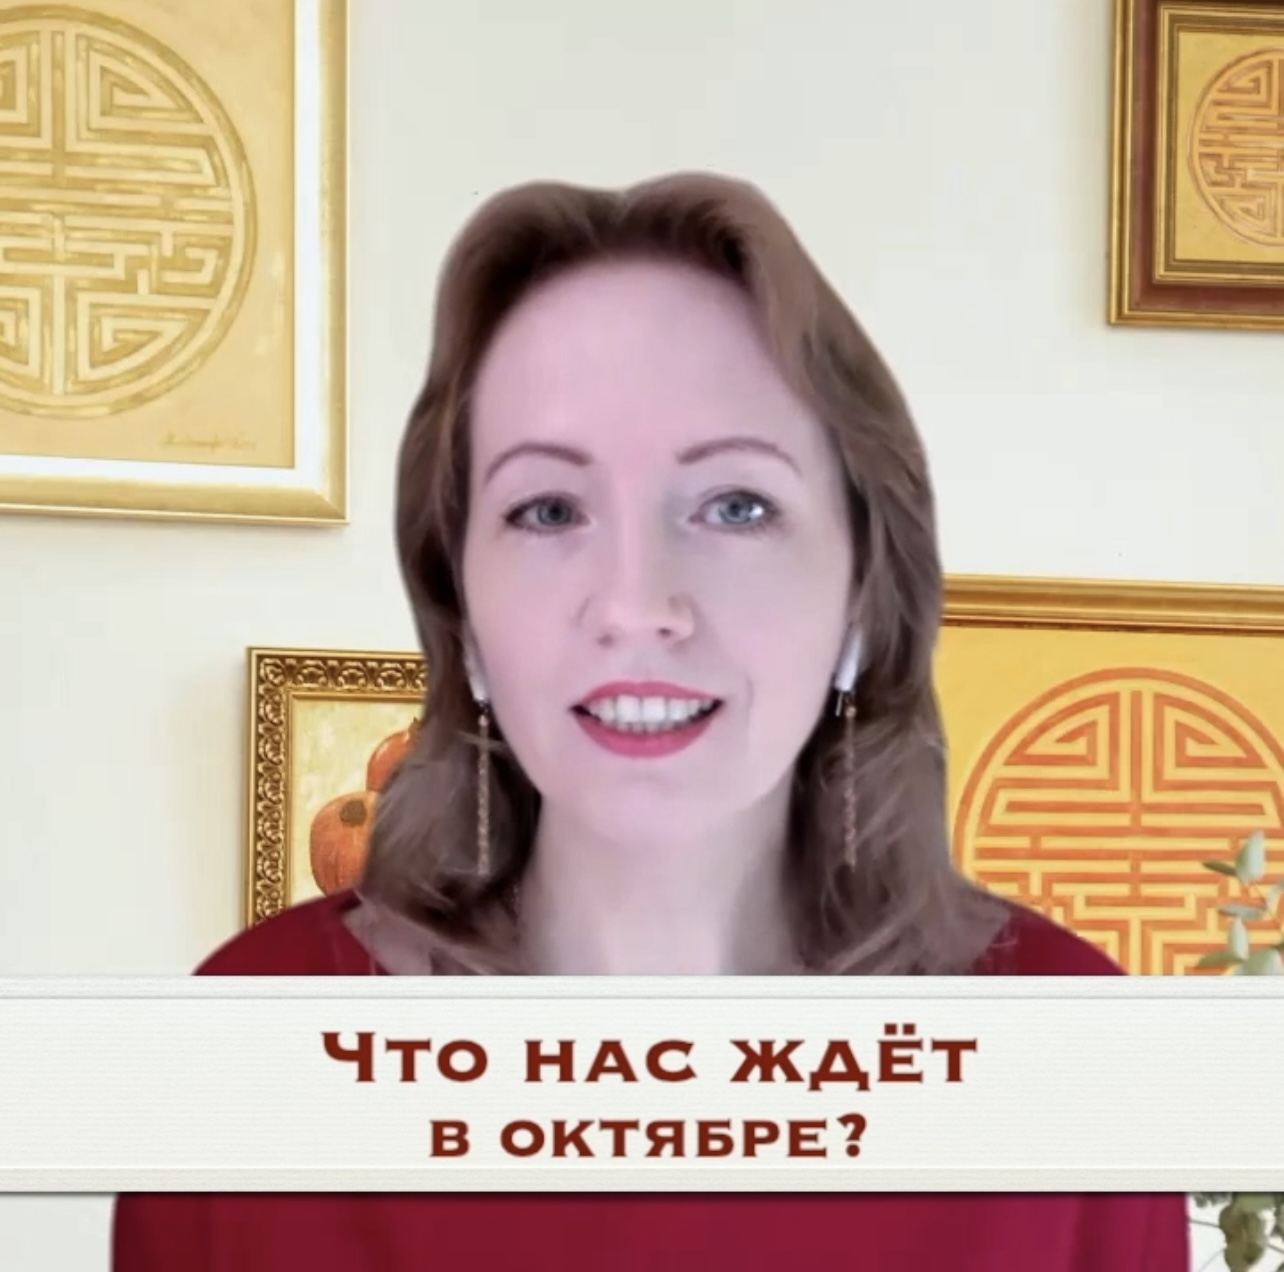 Астропрогноз на 9 лунный месяц • Milana.Ru